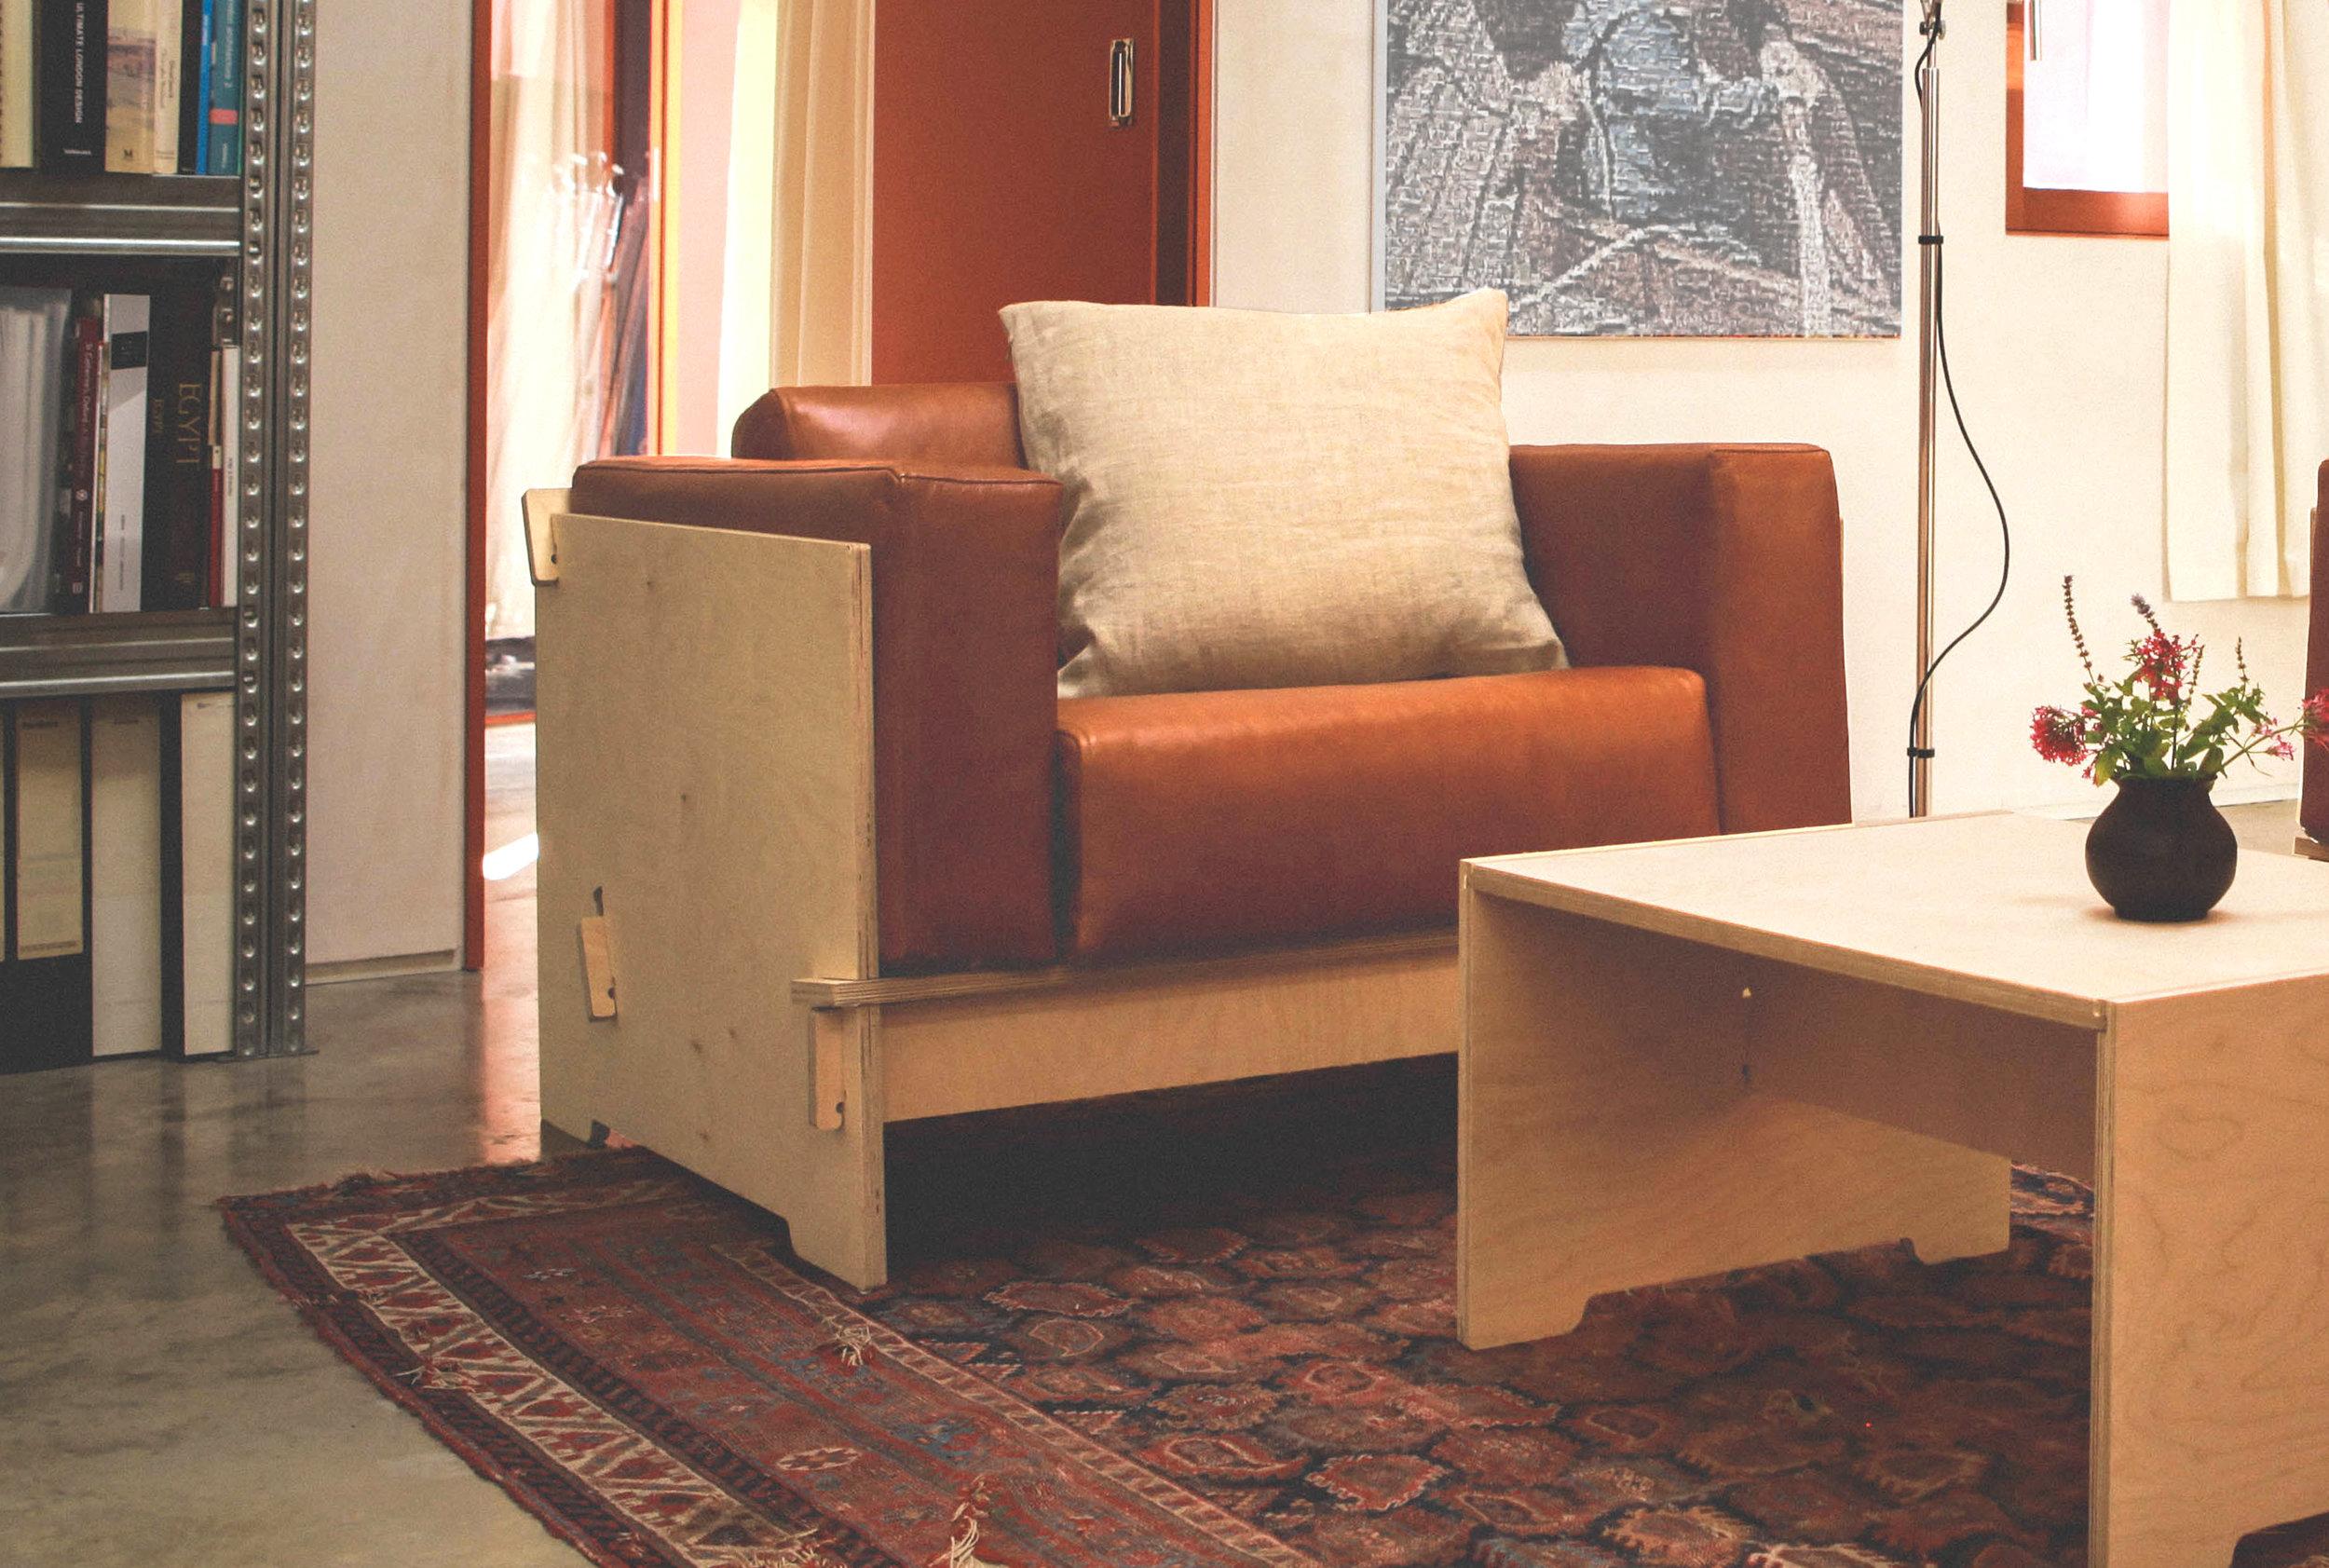 armchair_env4.jpg